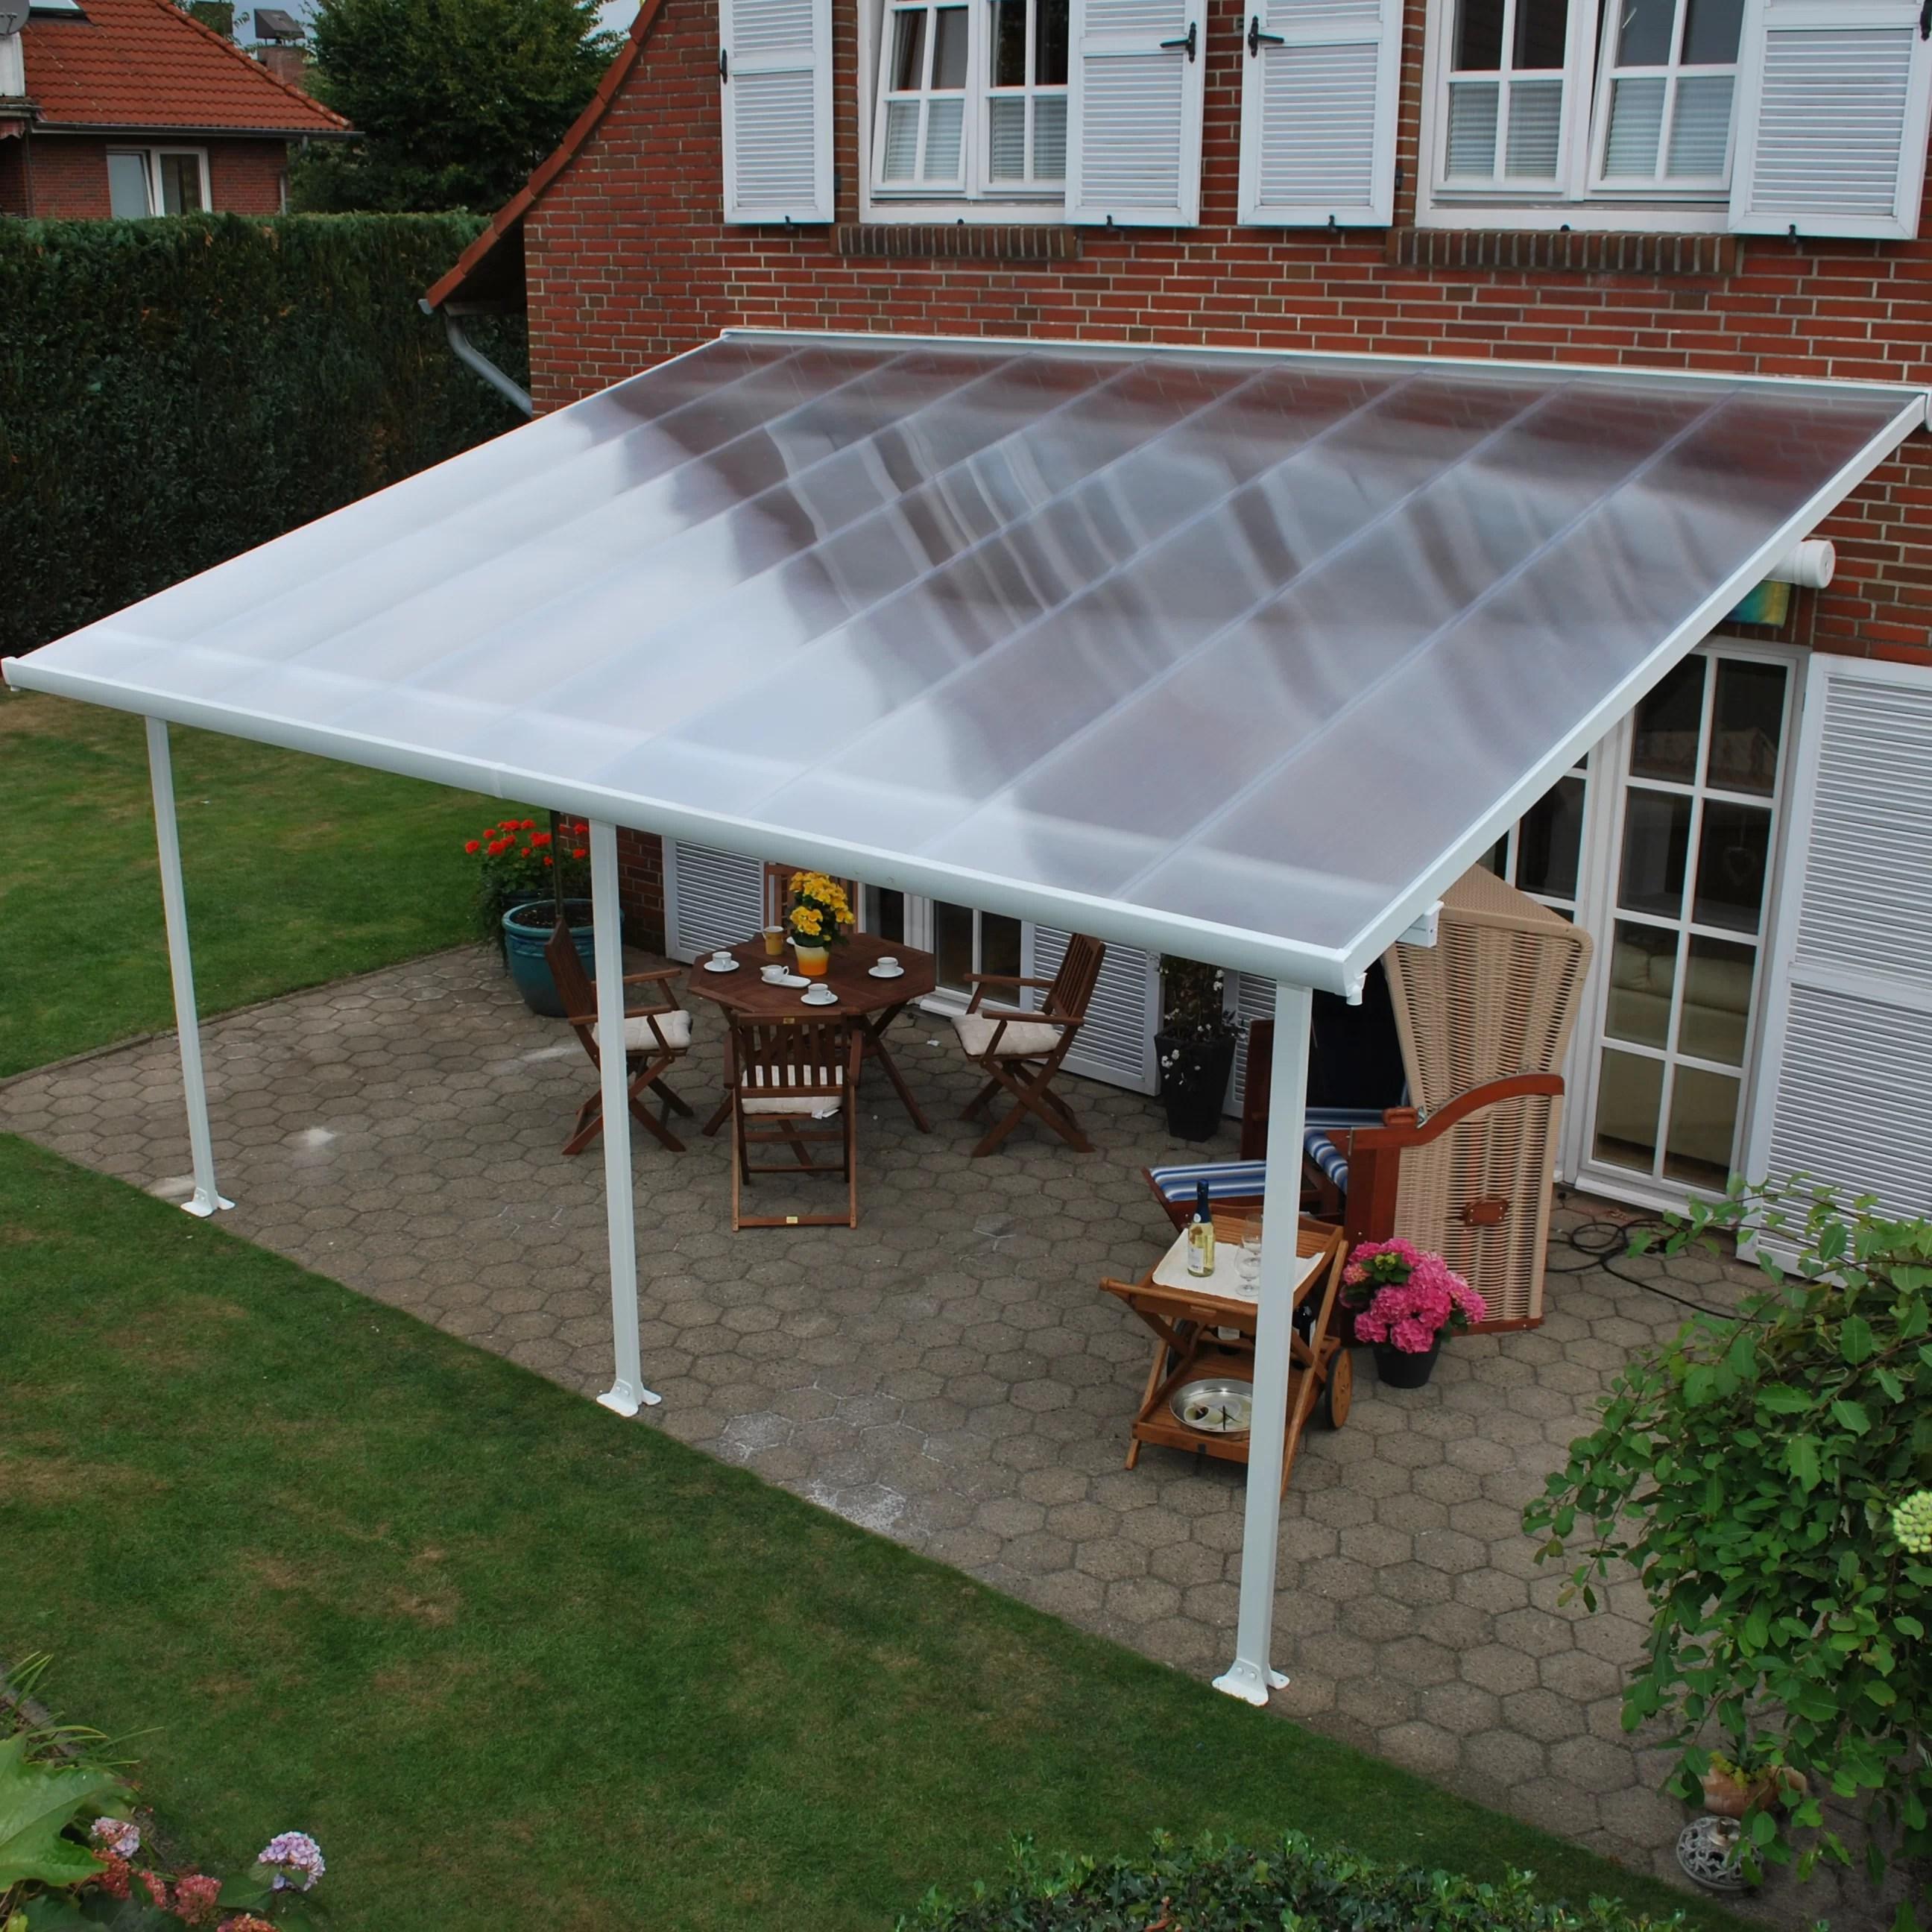 feria 28 ft w x 13 ft d plastic standard patio awning